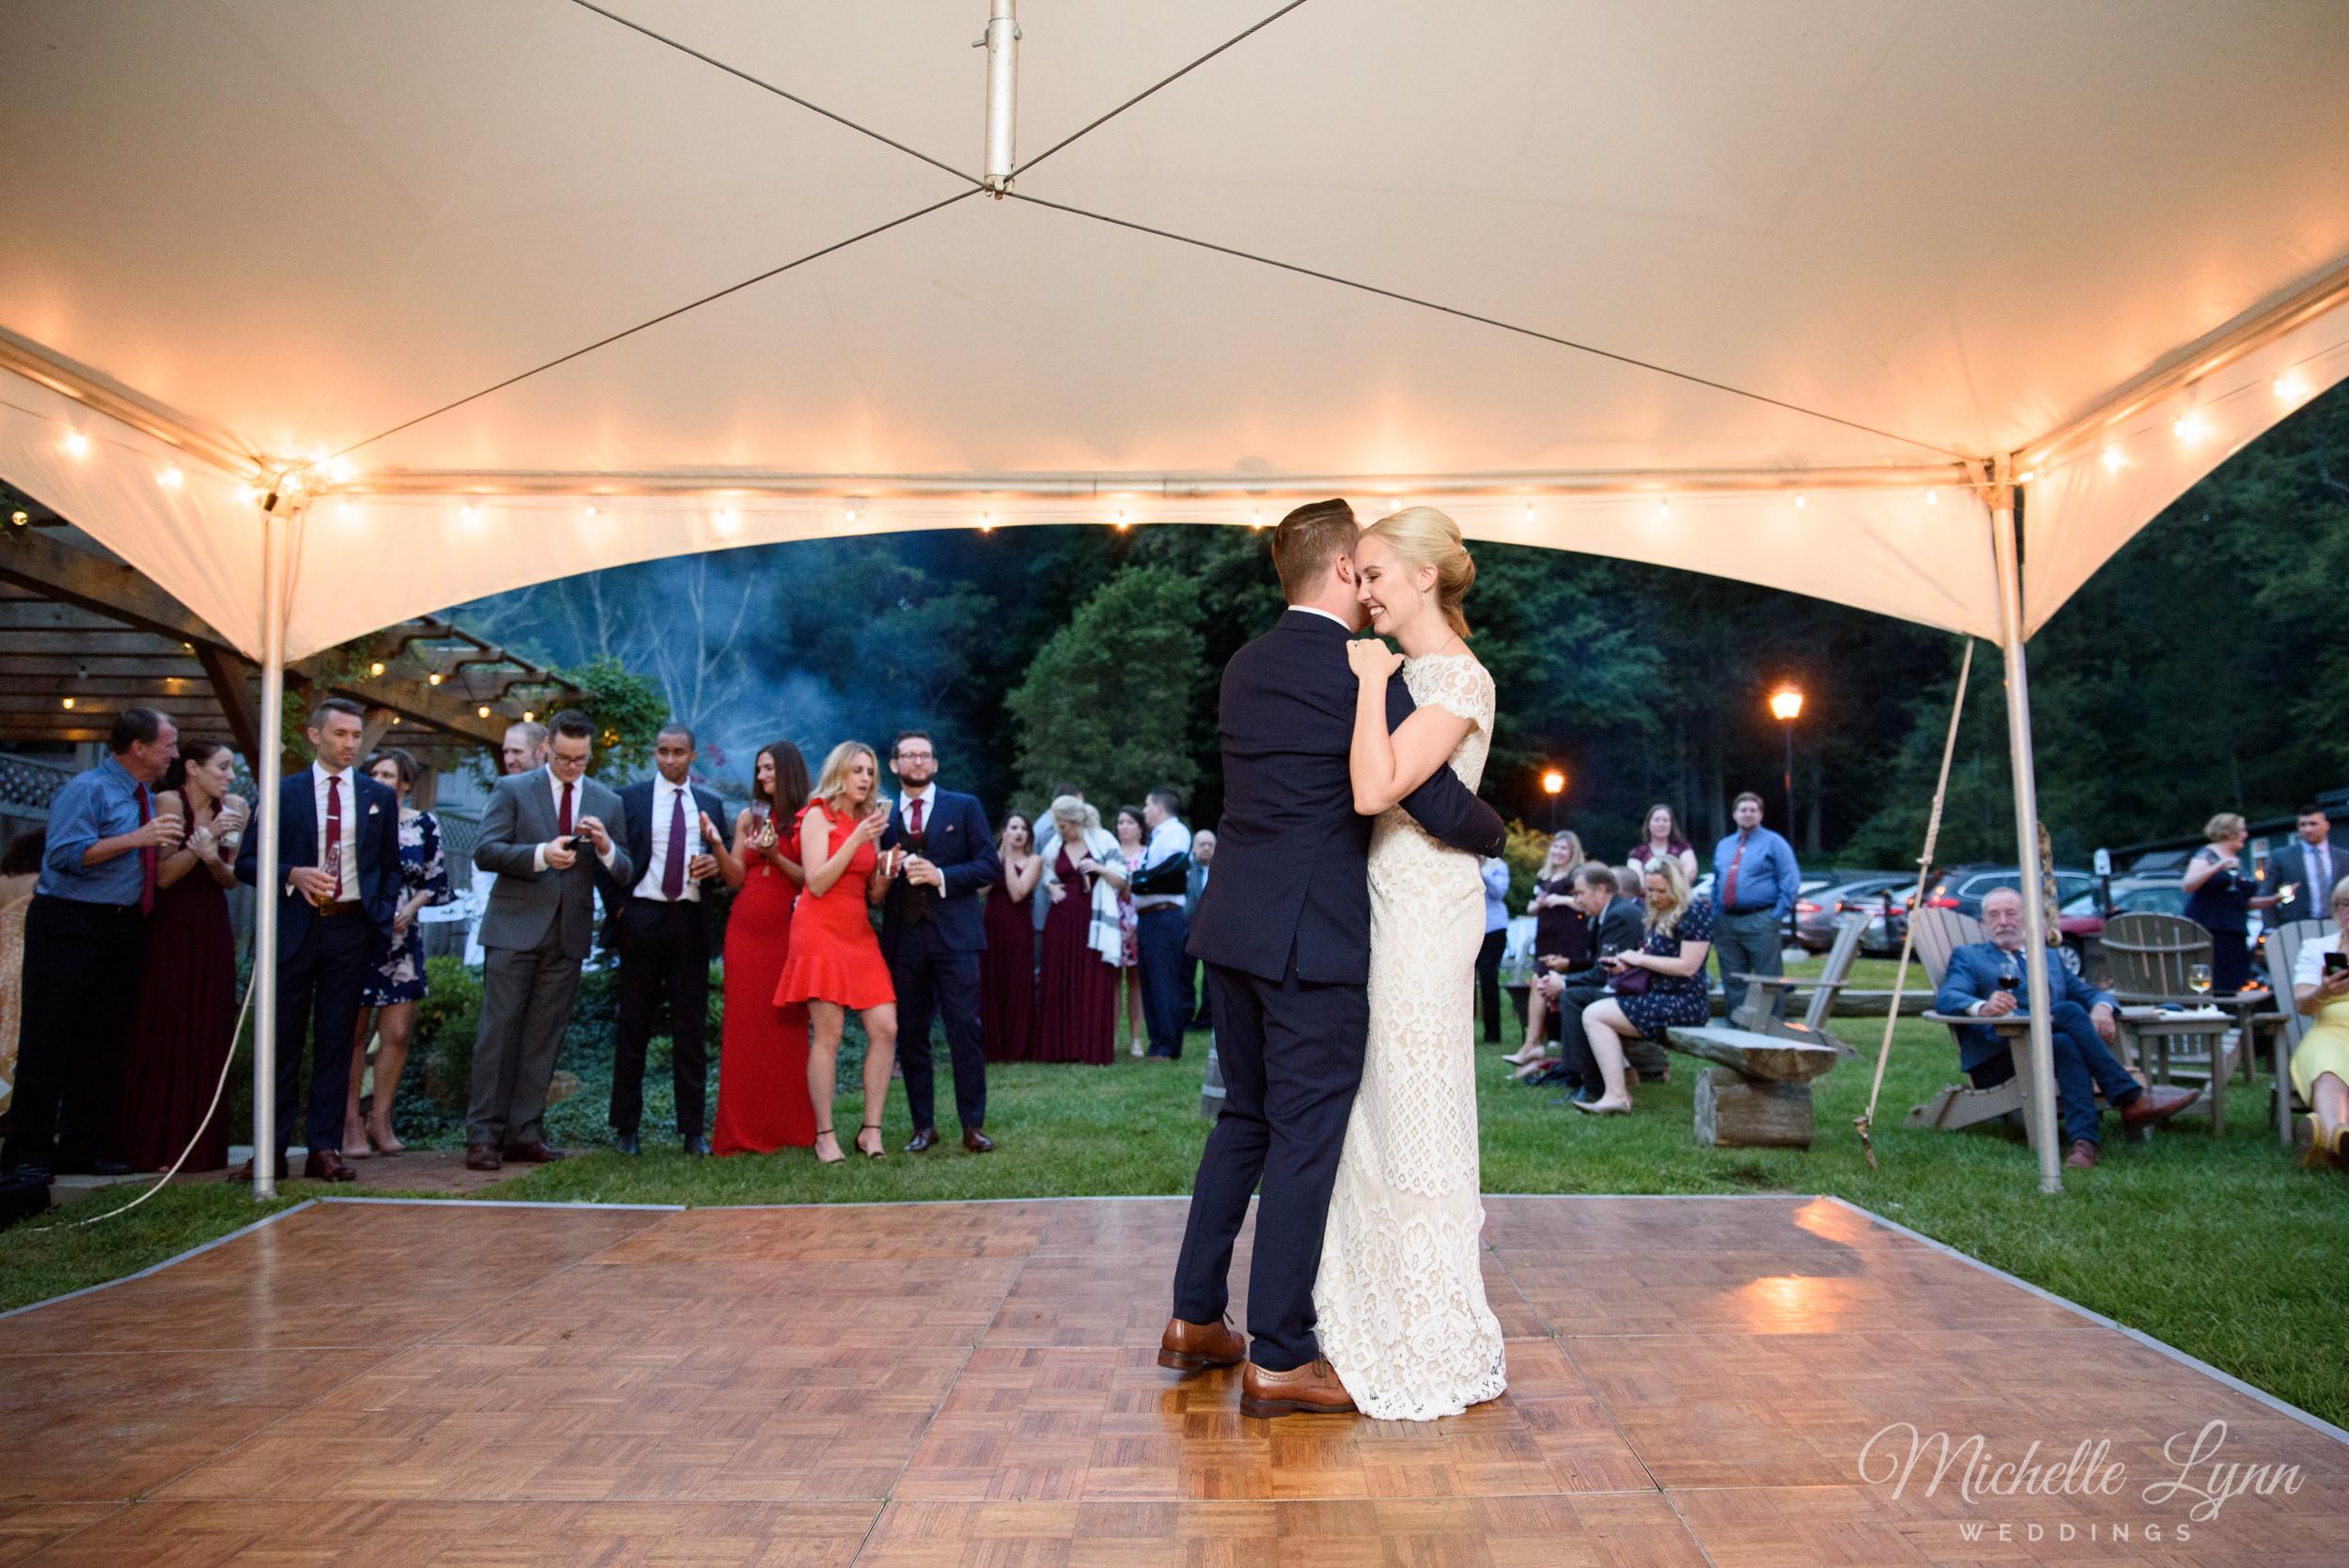 mlw-lumberville-general-store-new-hope-wedding-photographer-56.jpg